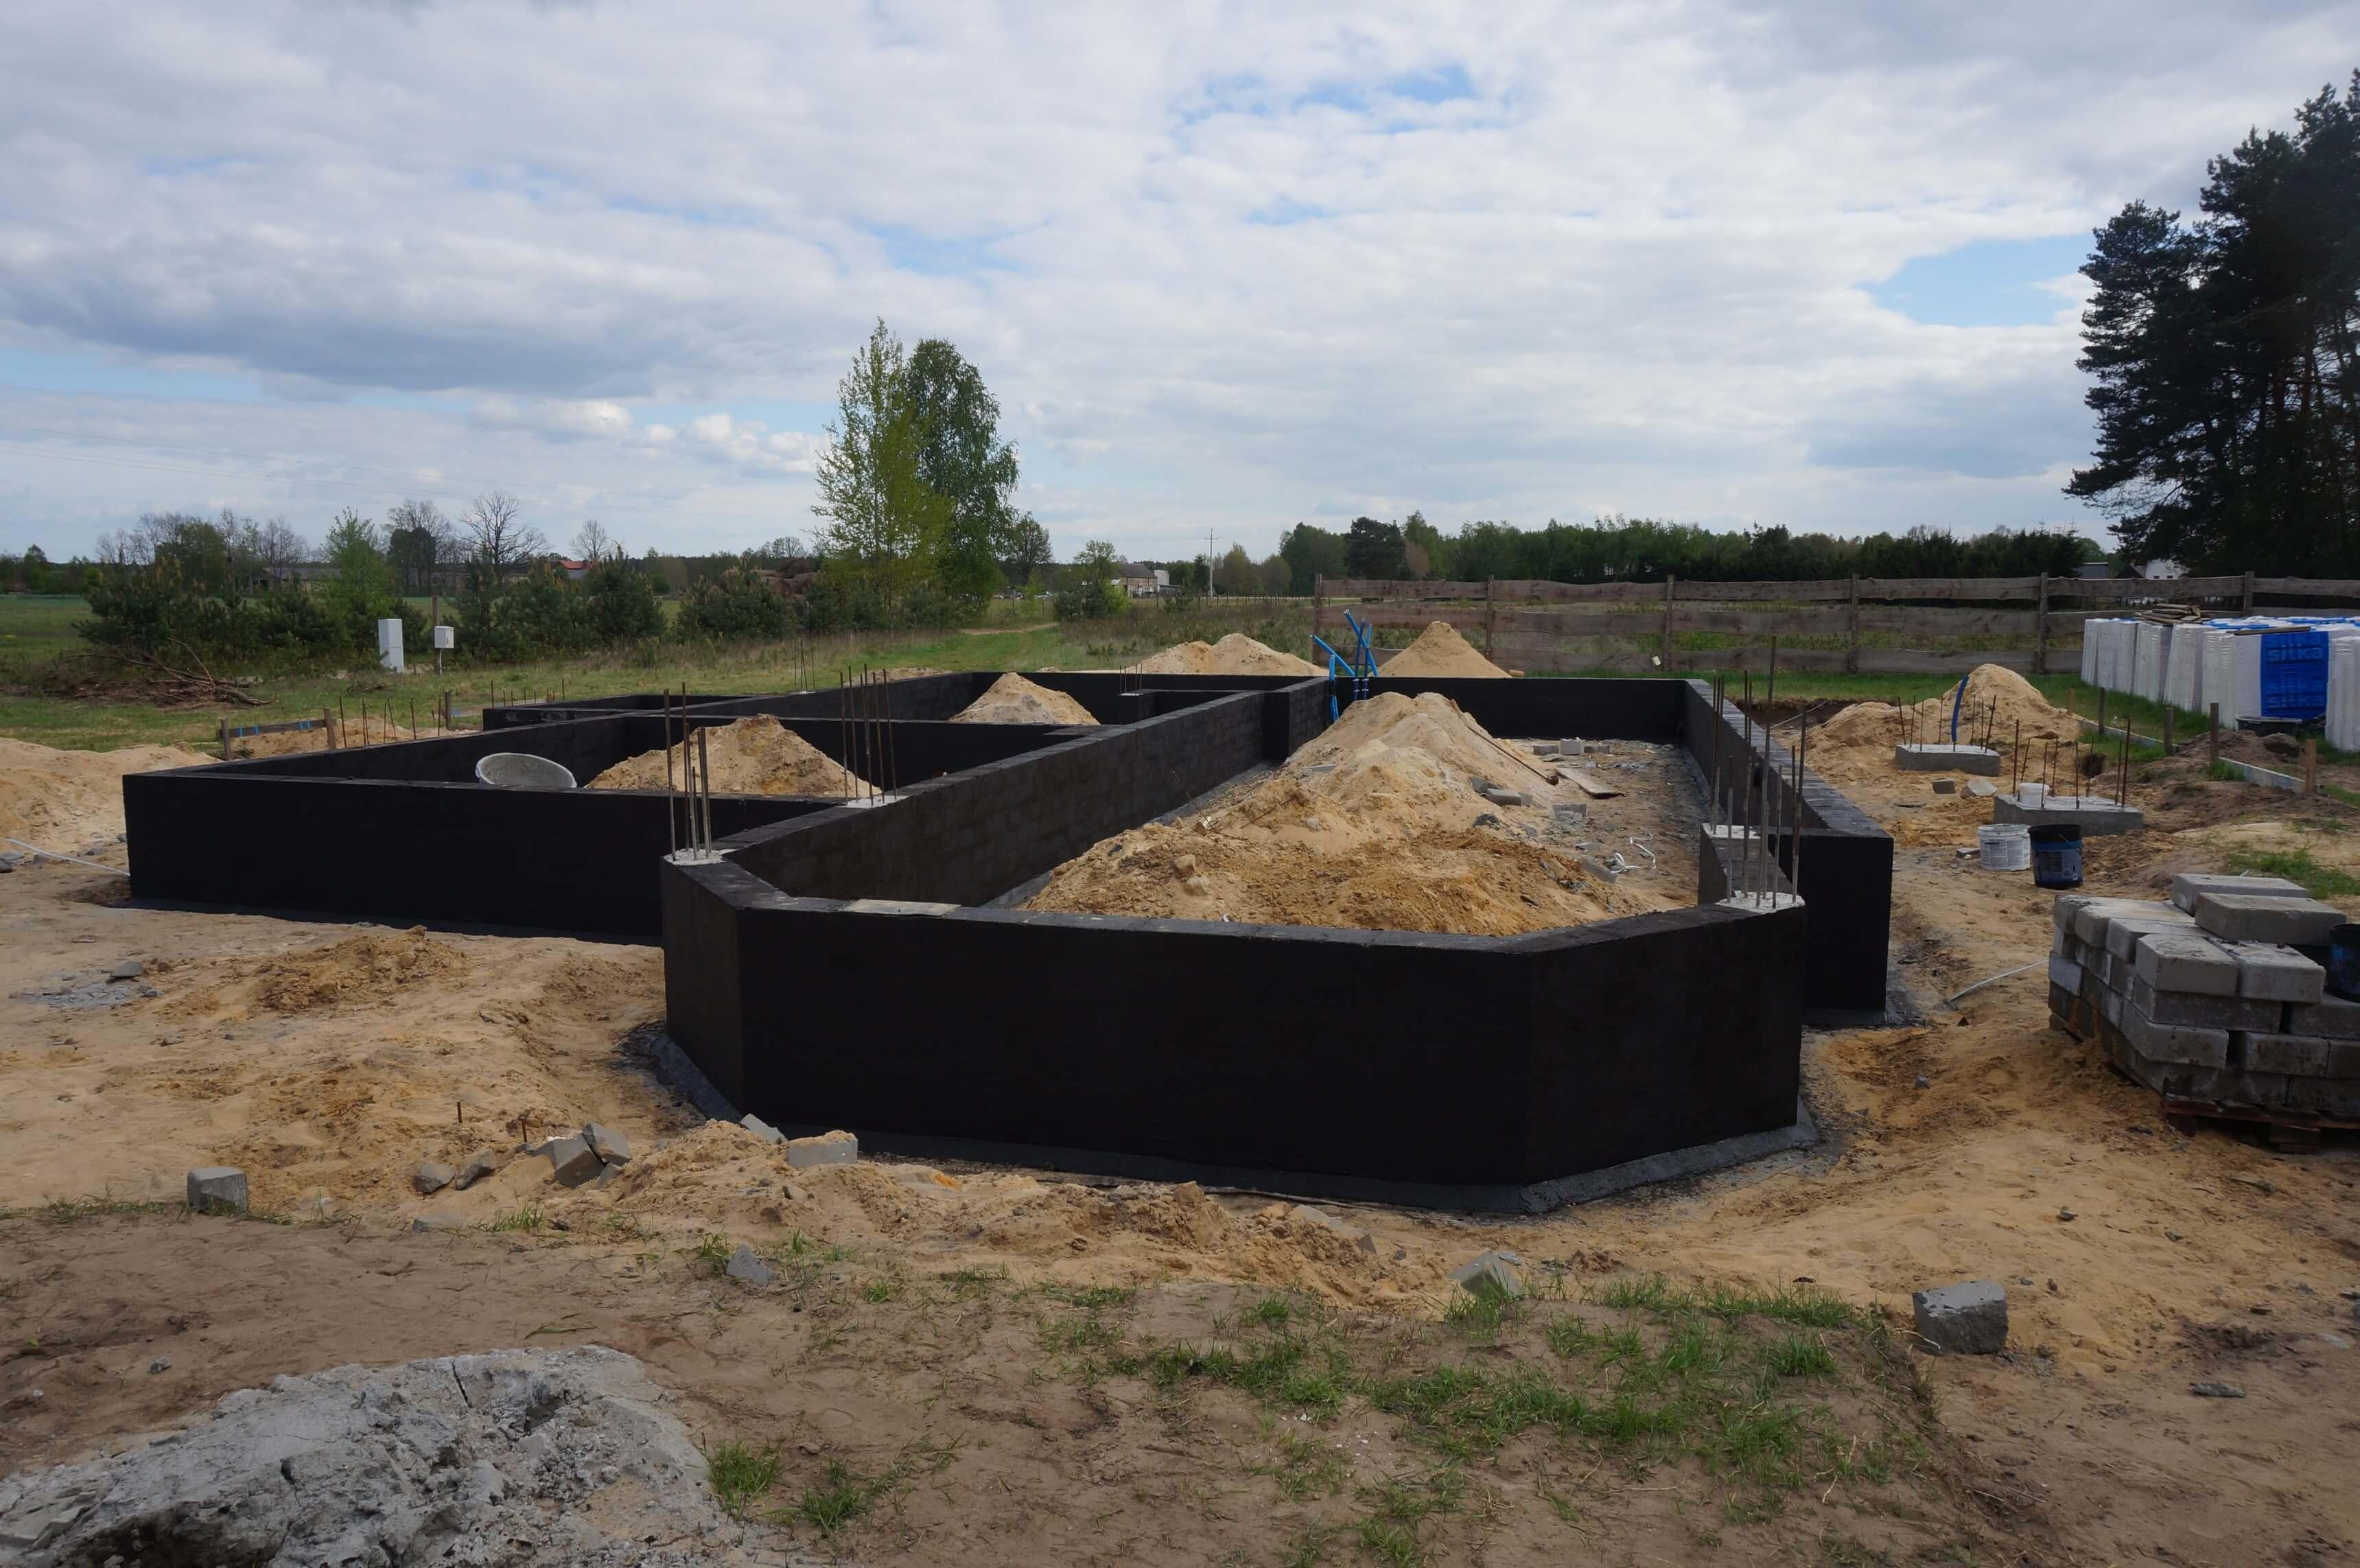 budowa dworku fundamenty kmb